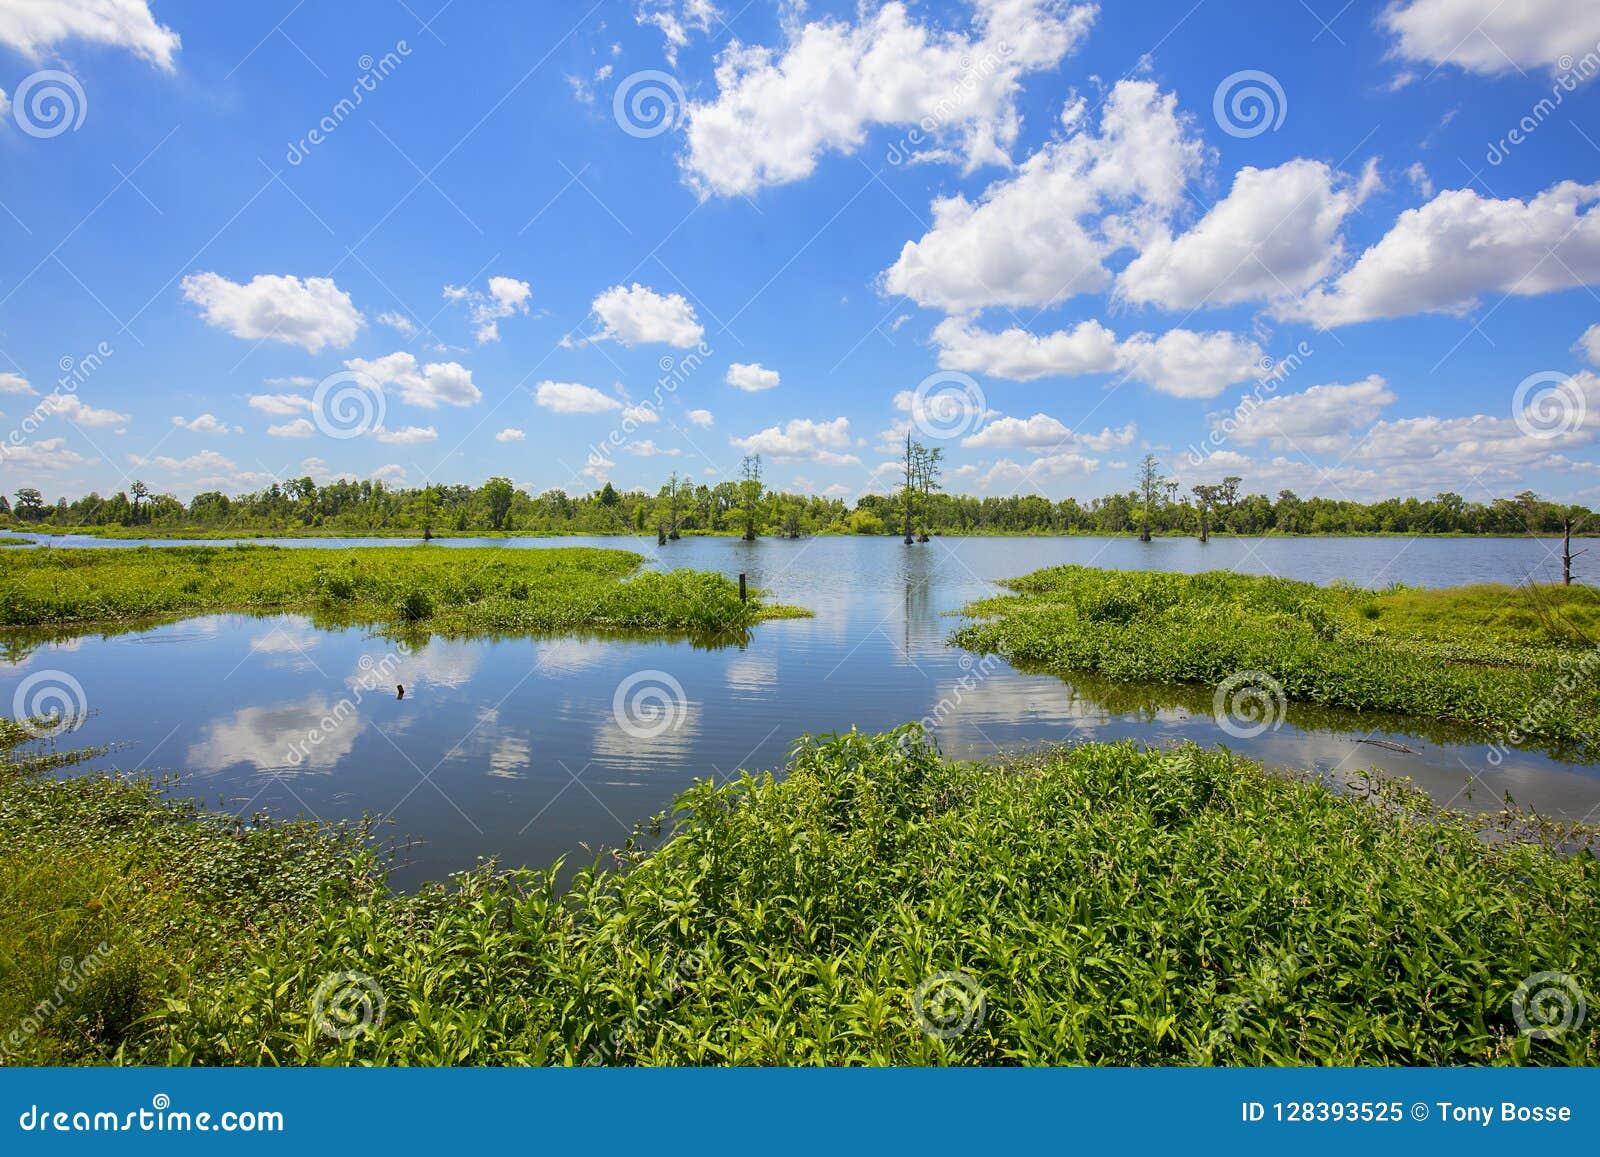 Lakes In Florida Wetlands